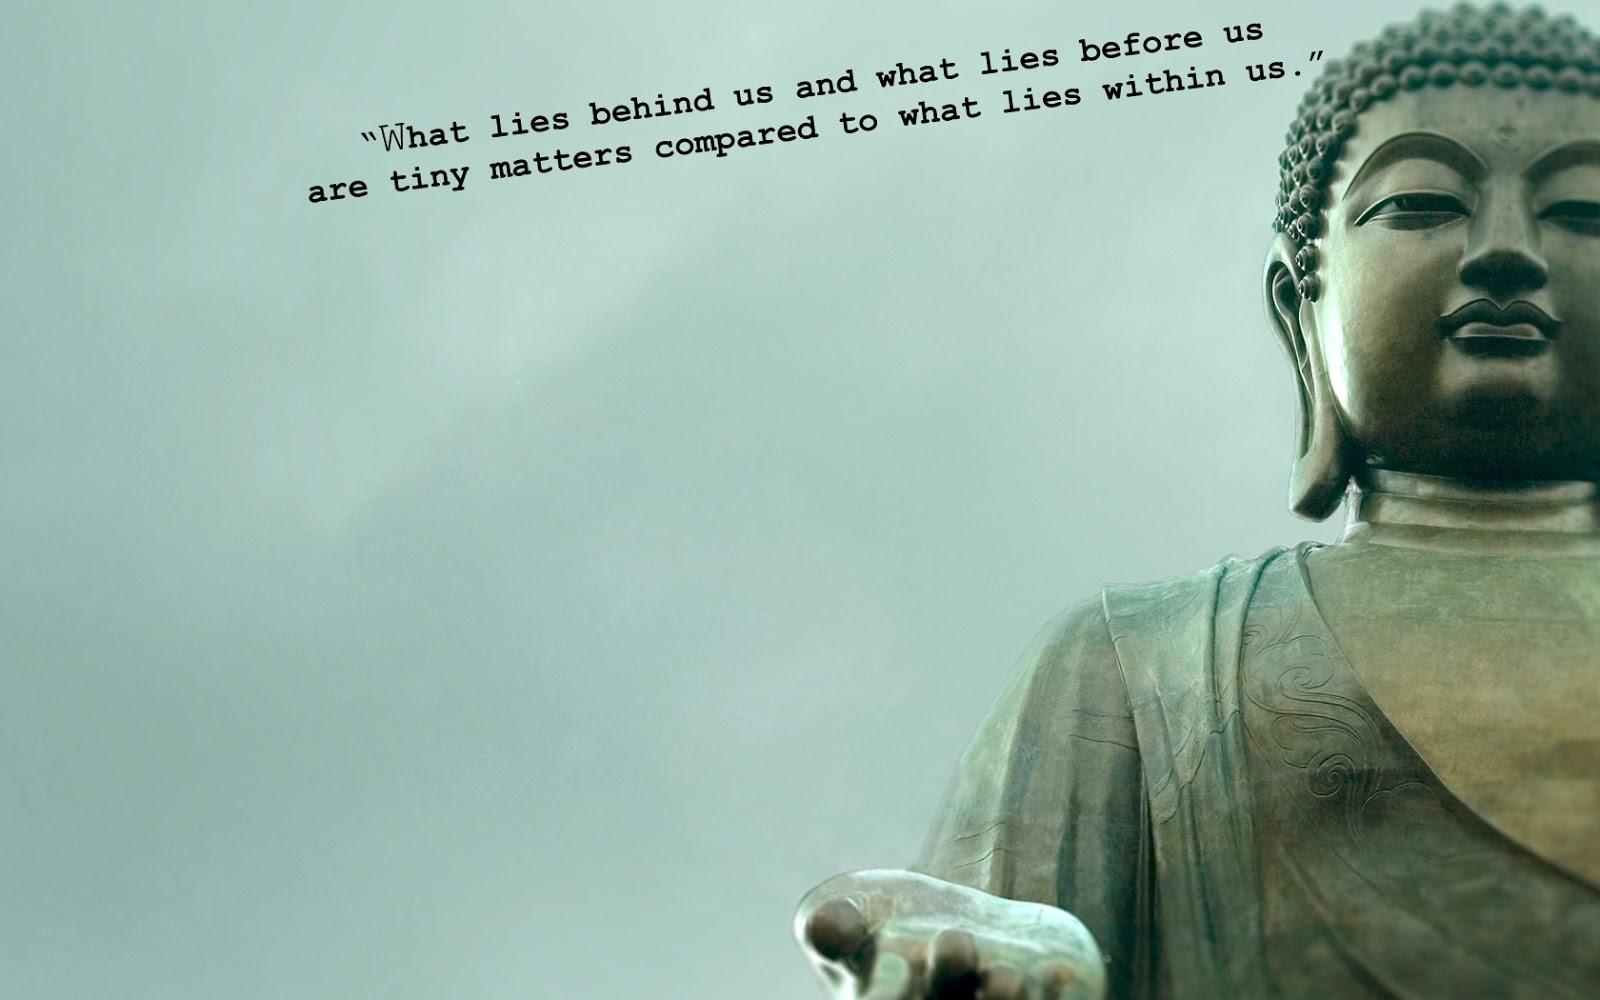 buddha-meditation-image-quote-picture.jpg